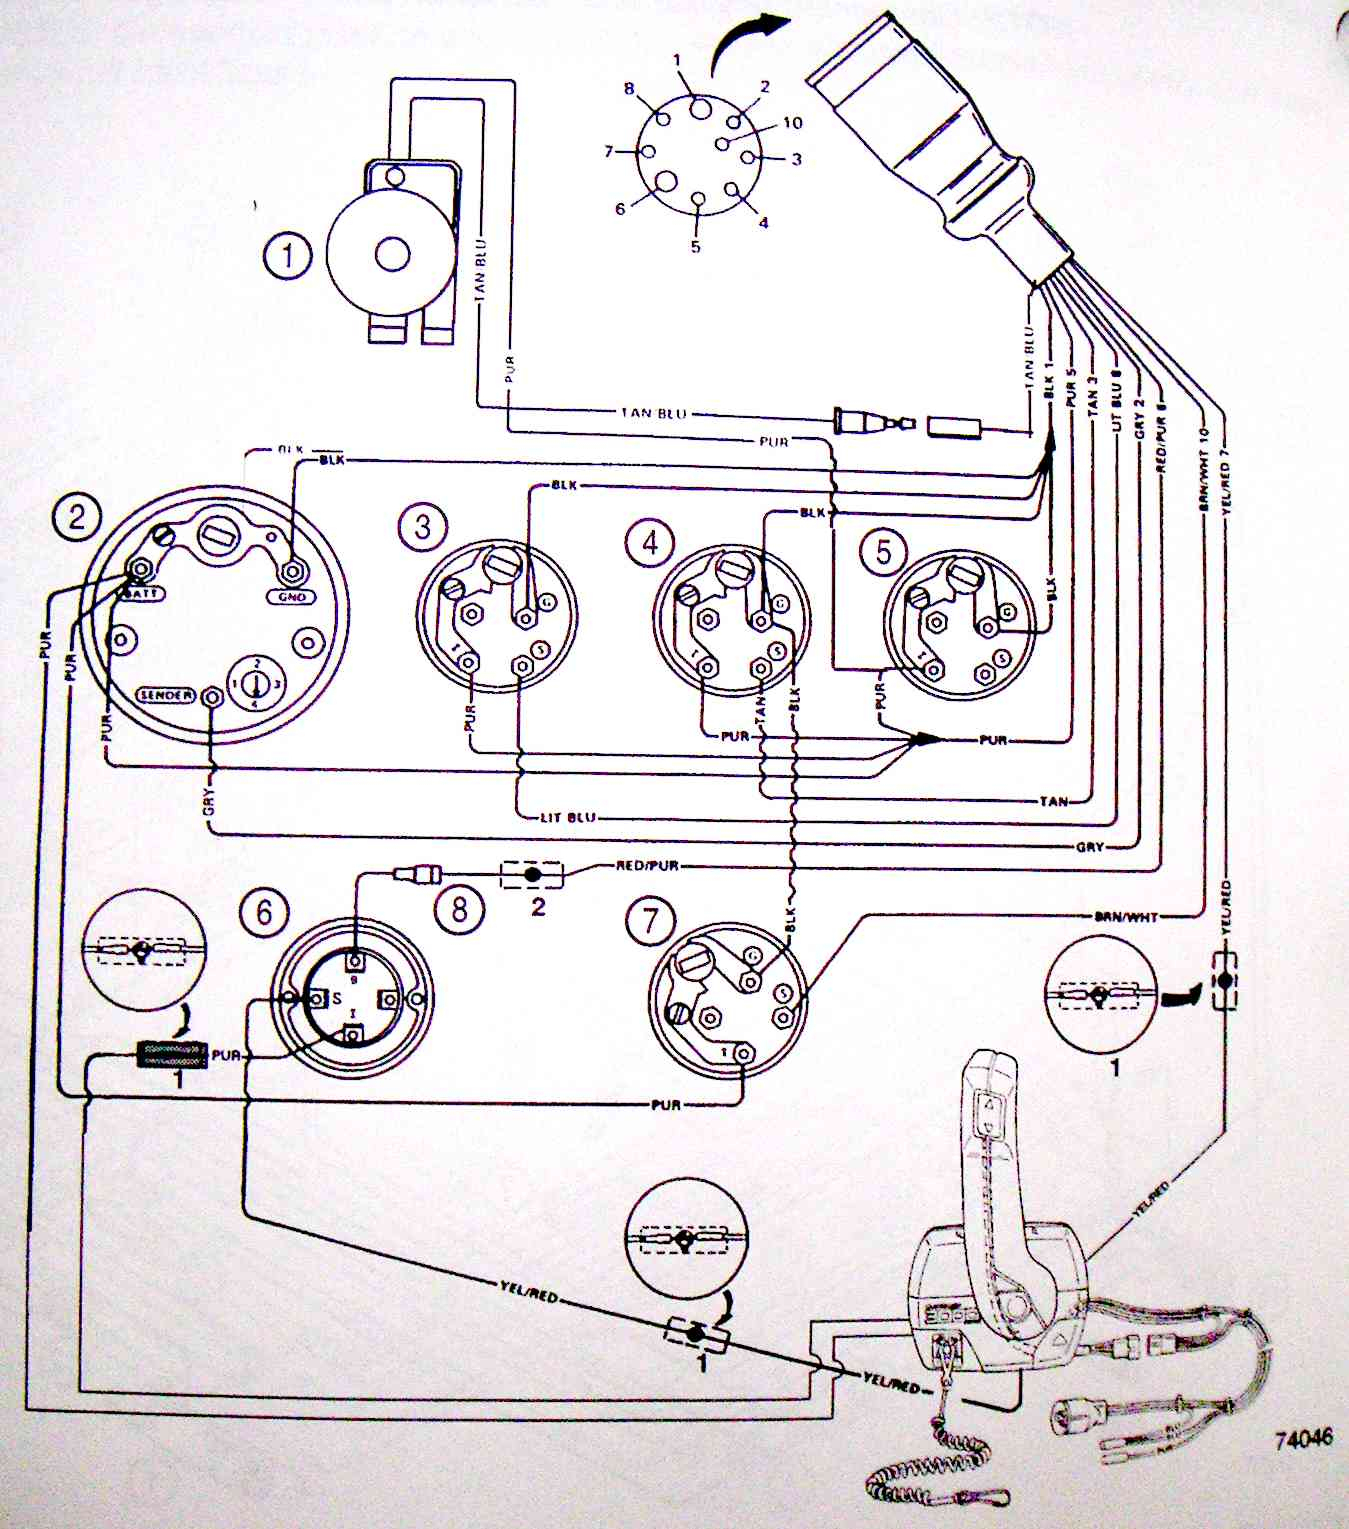 11 Gauge Wire Diagram Wiring Diagram